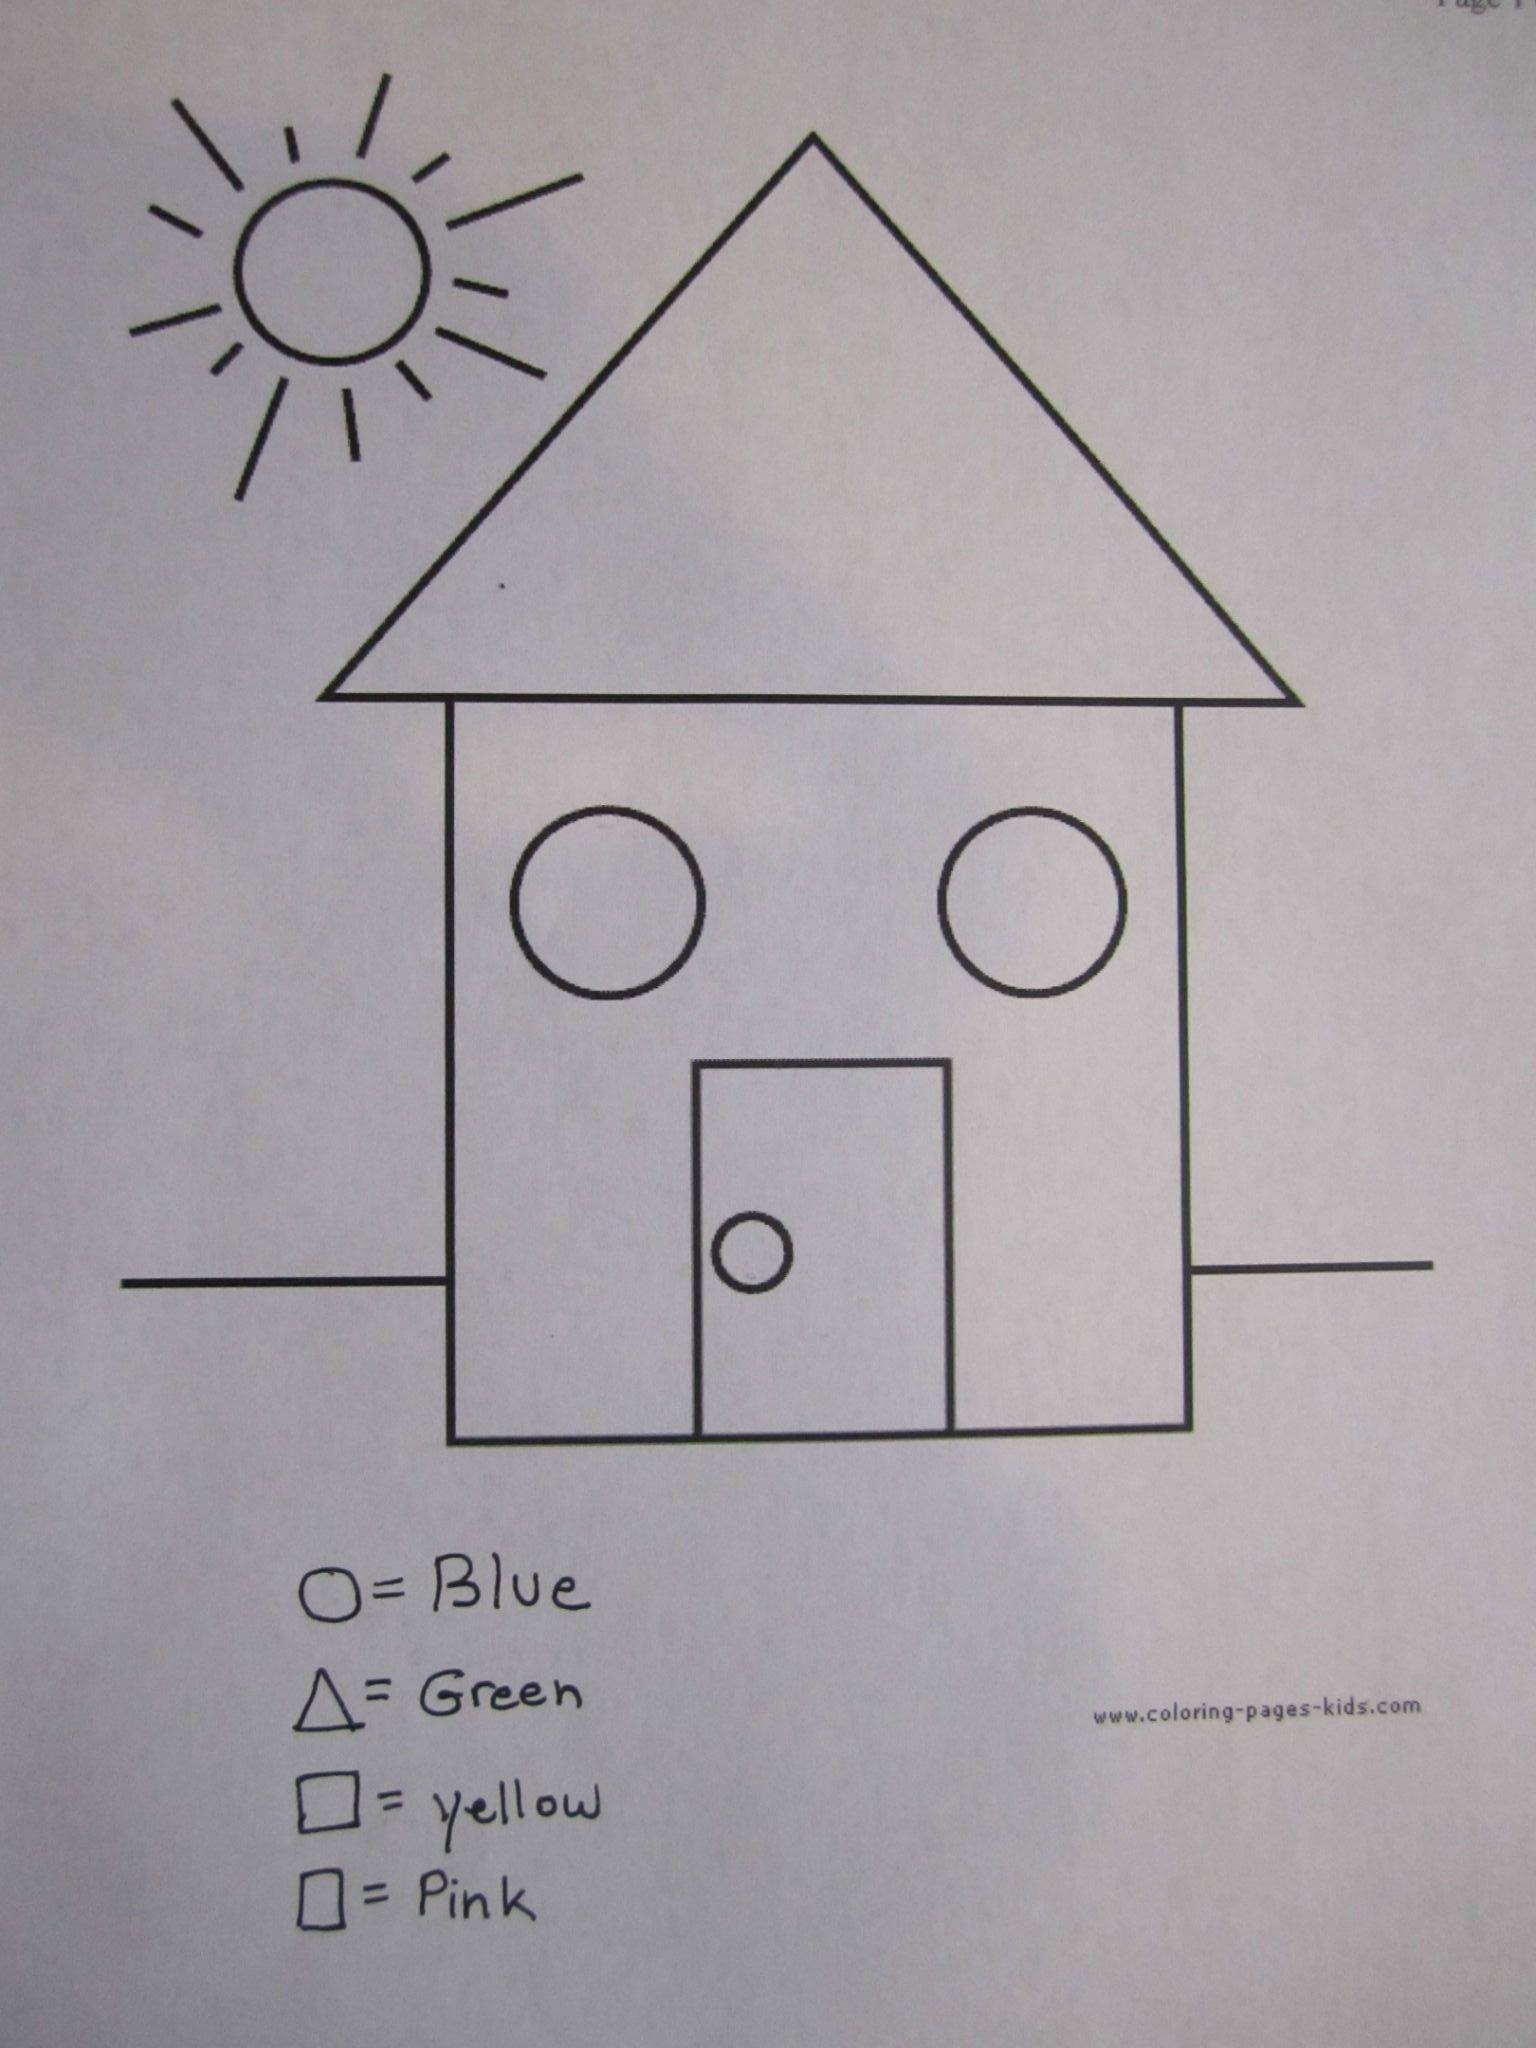 Colouring shapes activities - Visual Perceptual Activities Form Constancy